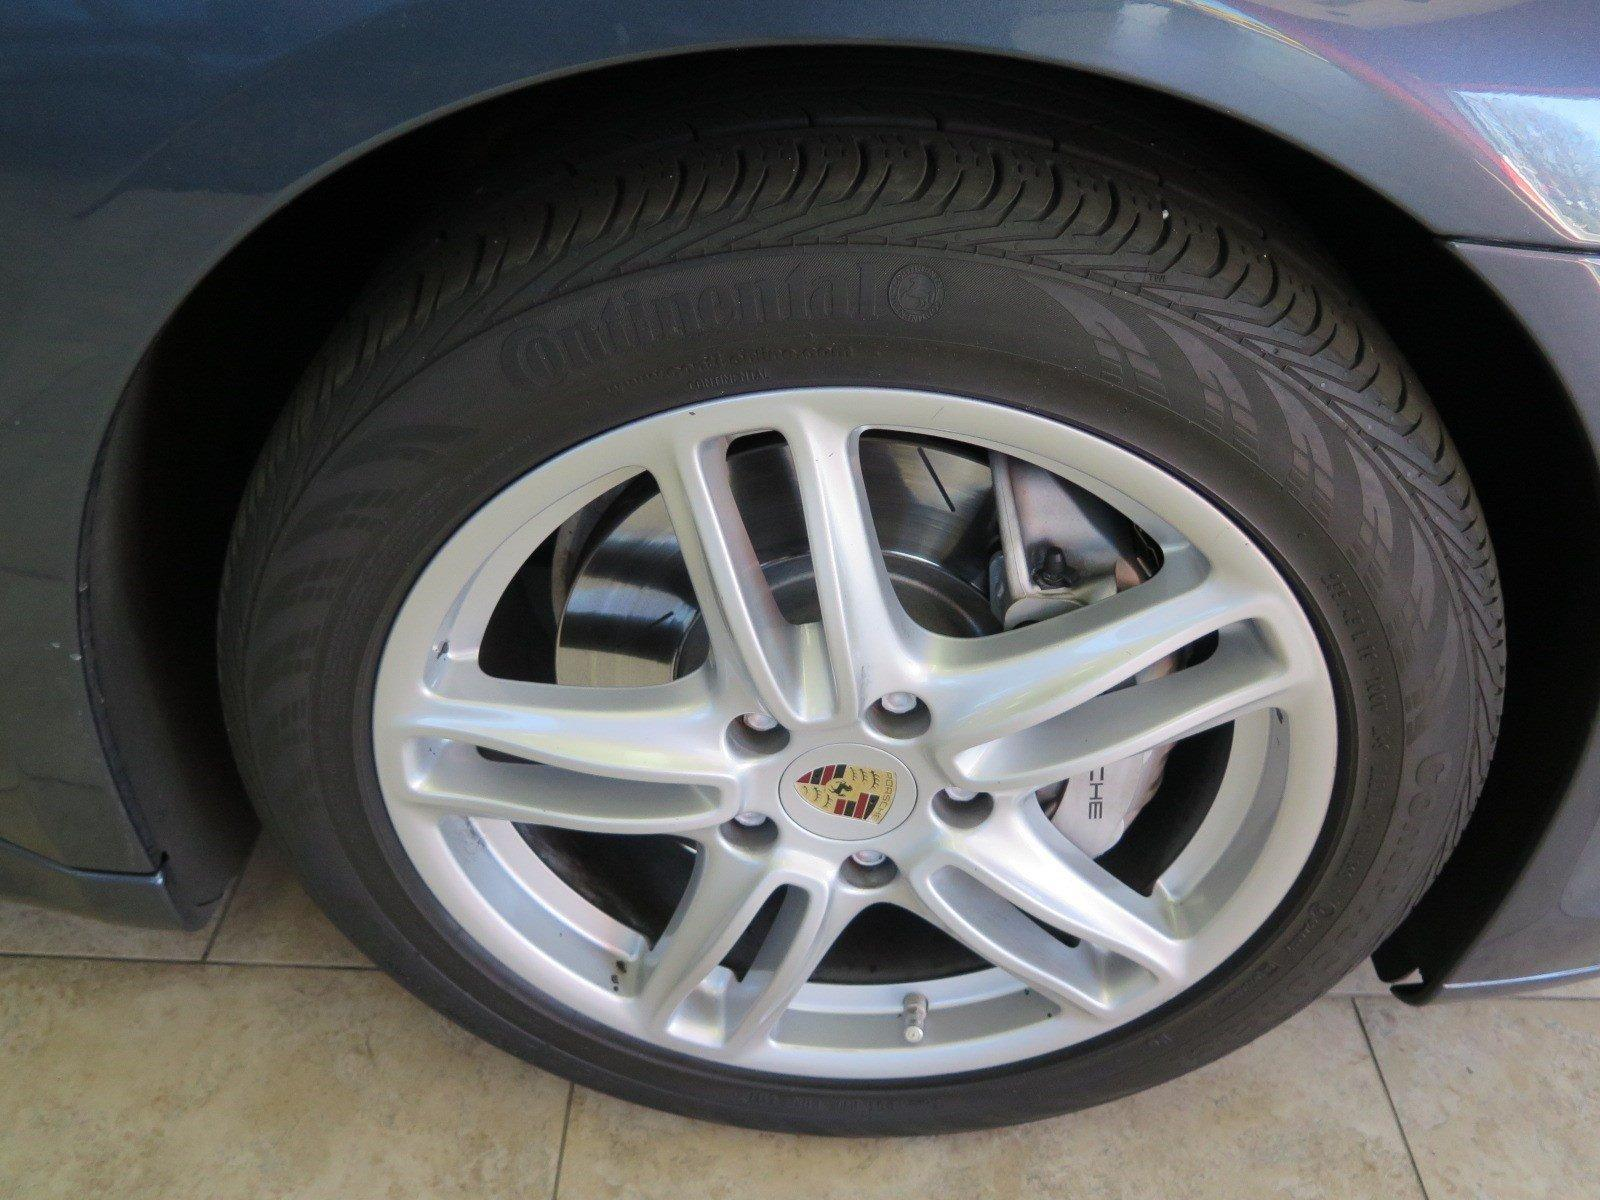 Used 2010 Porsche Panamera 4S for sale Sold at Gravity Autos Atlanta in Chamblee GA 30341 15